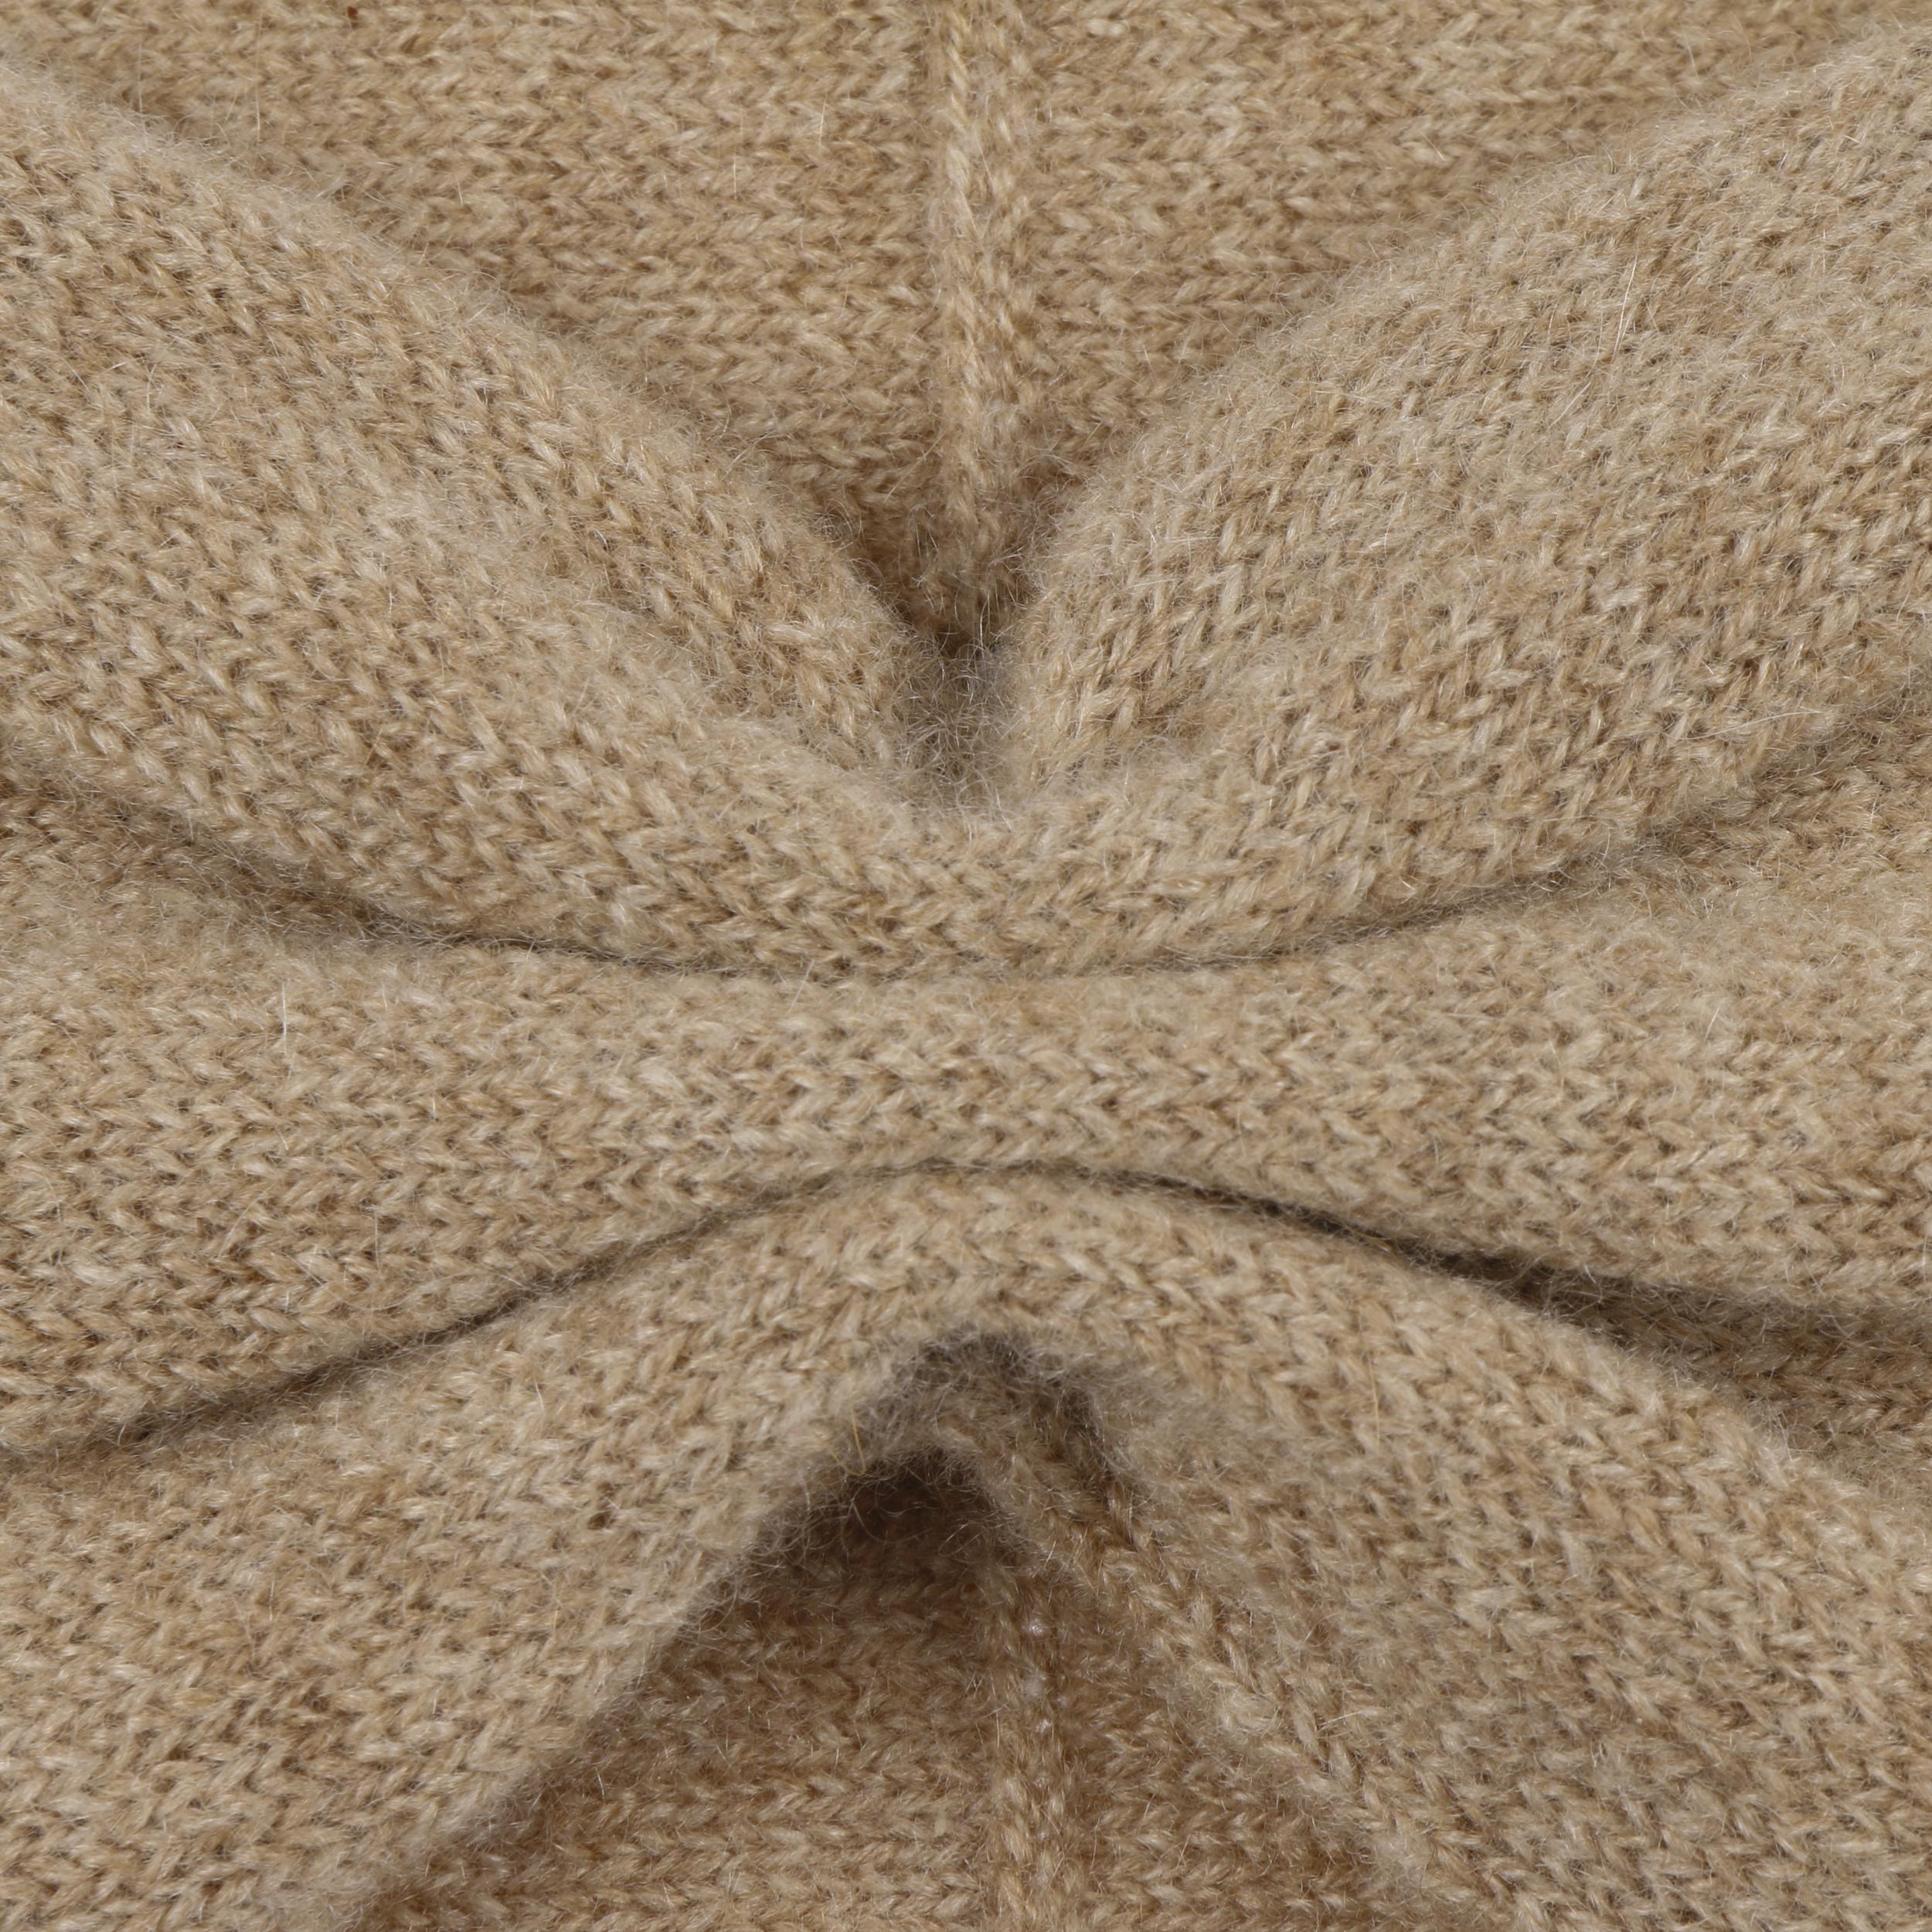 ddbdb1c00b8b57 Cashmere Headband by Roeckl - beige 1 ...